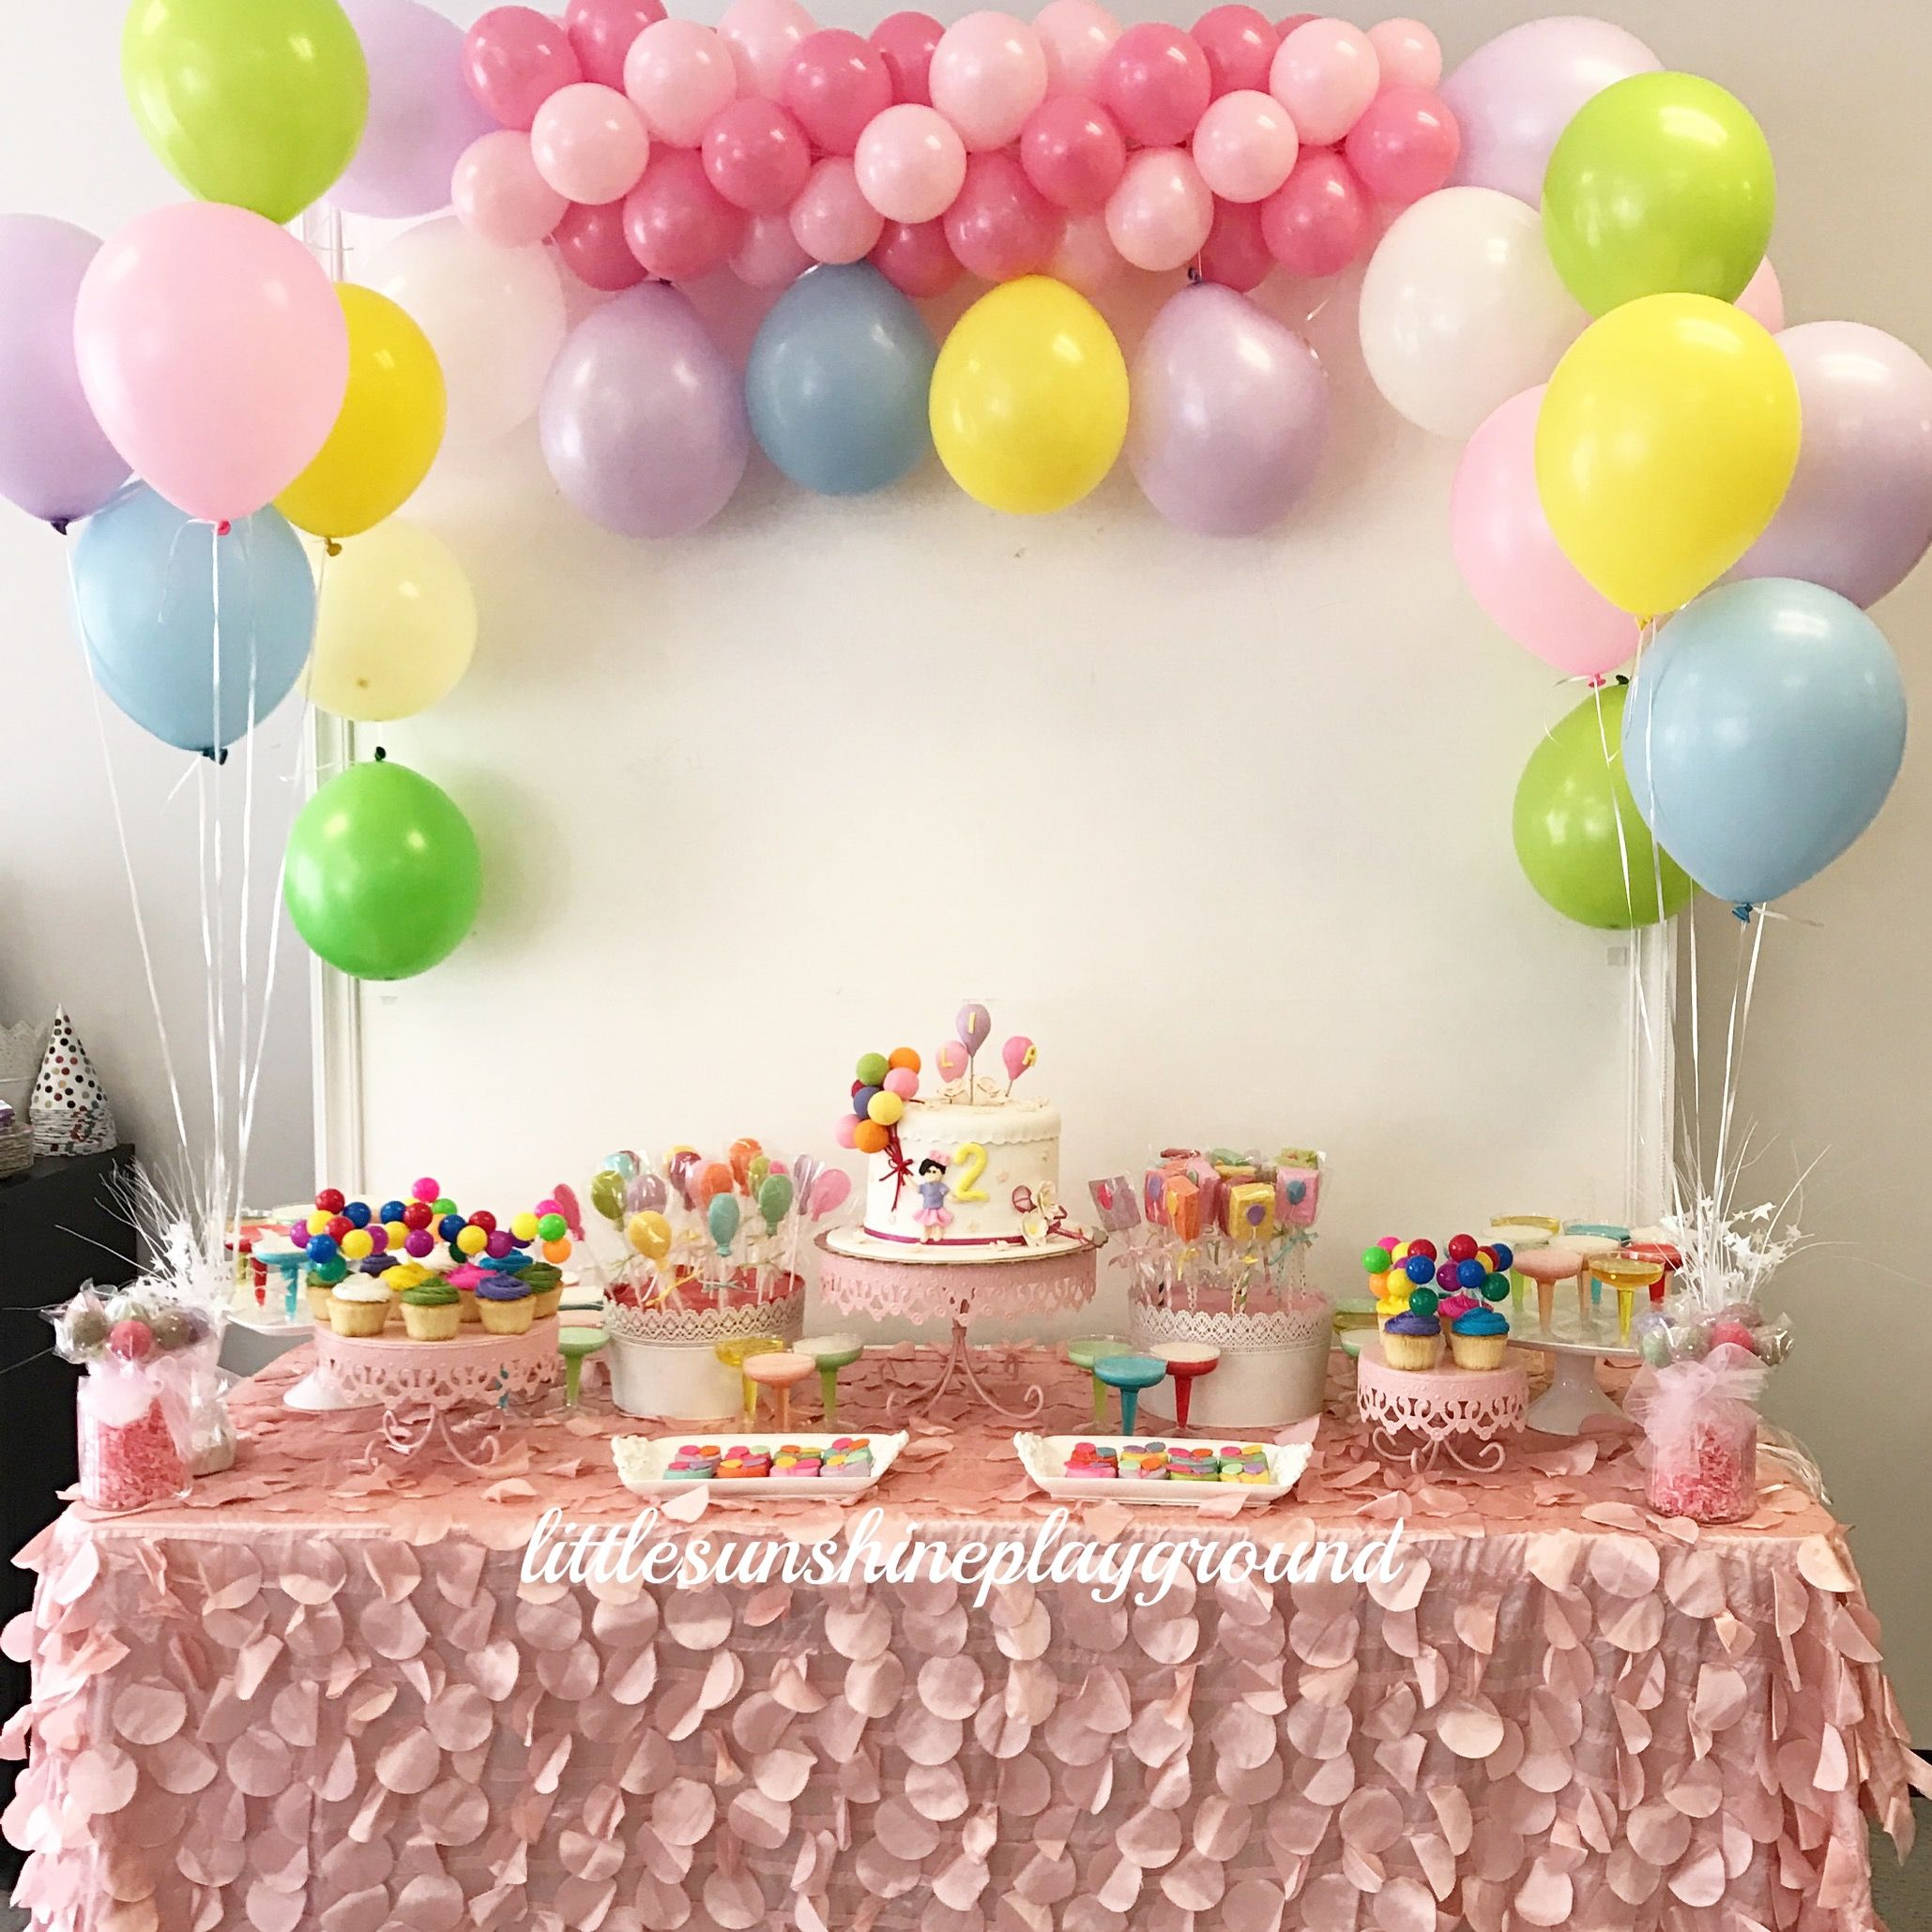 Happy Birthday To Beautiful Lia #birthday #birthdaygirl